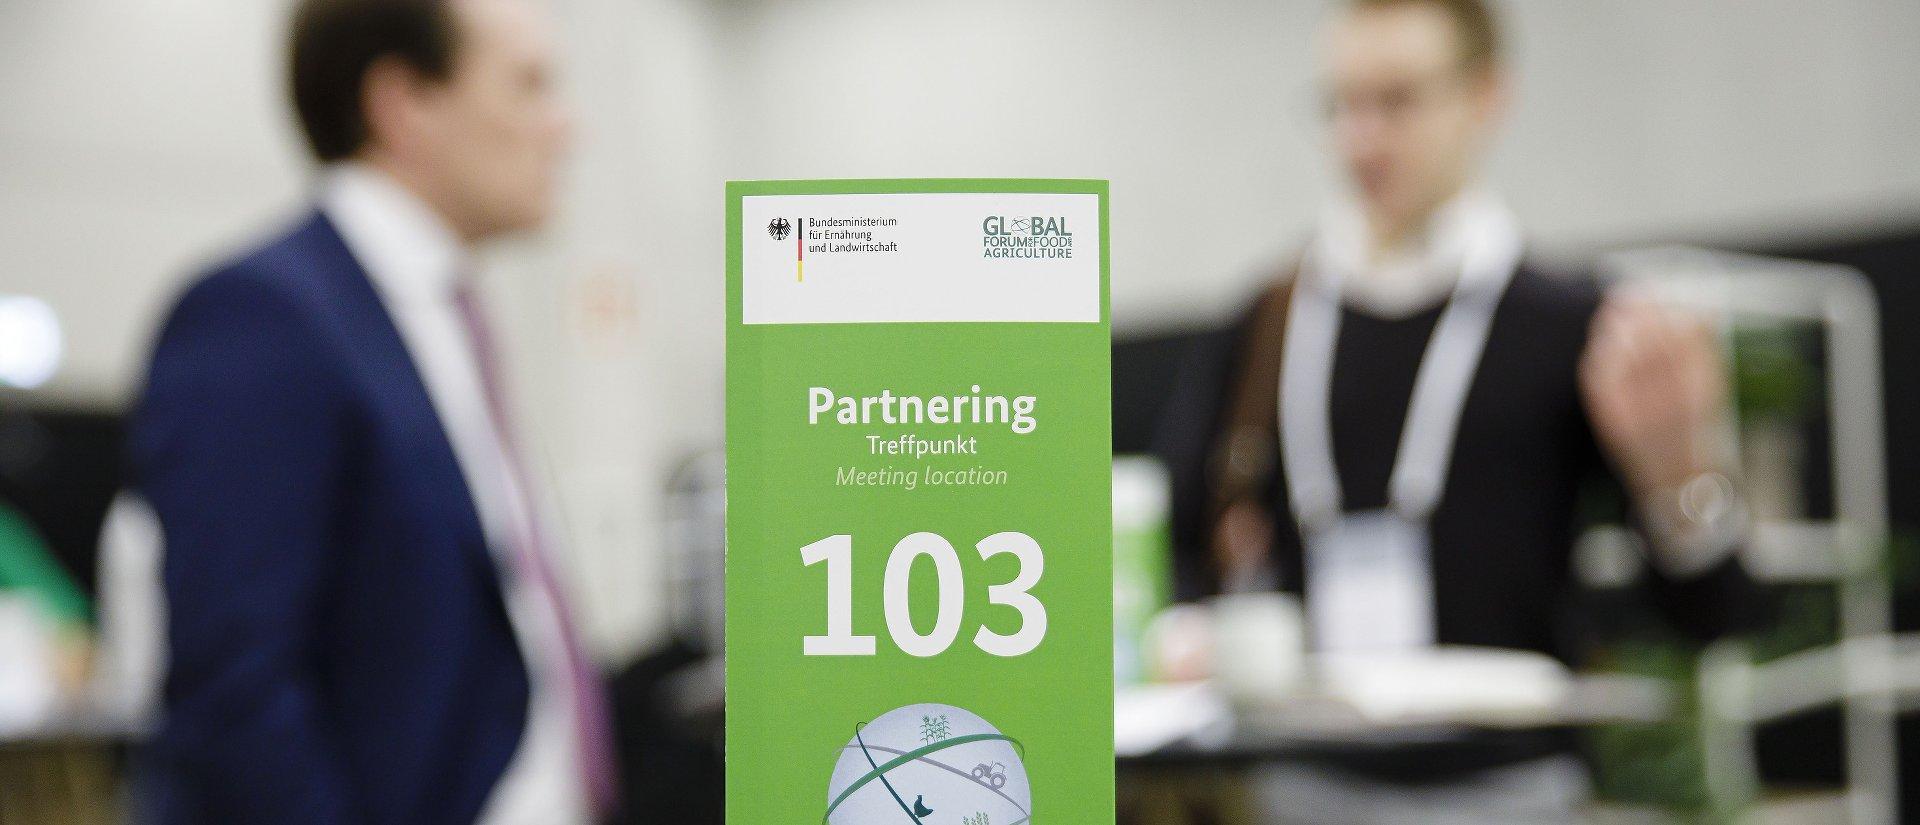 GFFA 2020 | Partnering